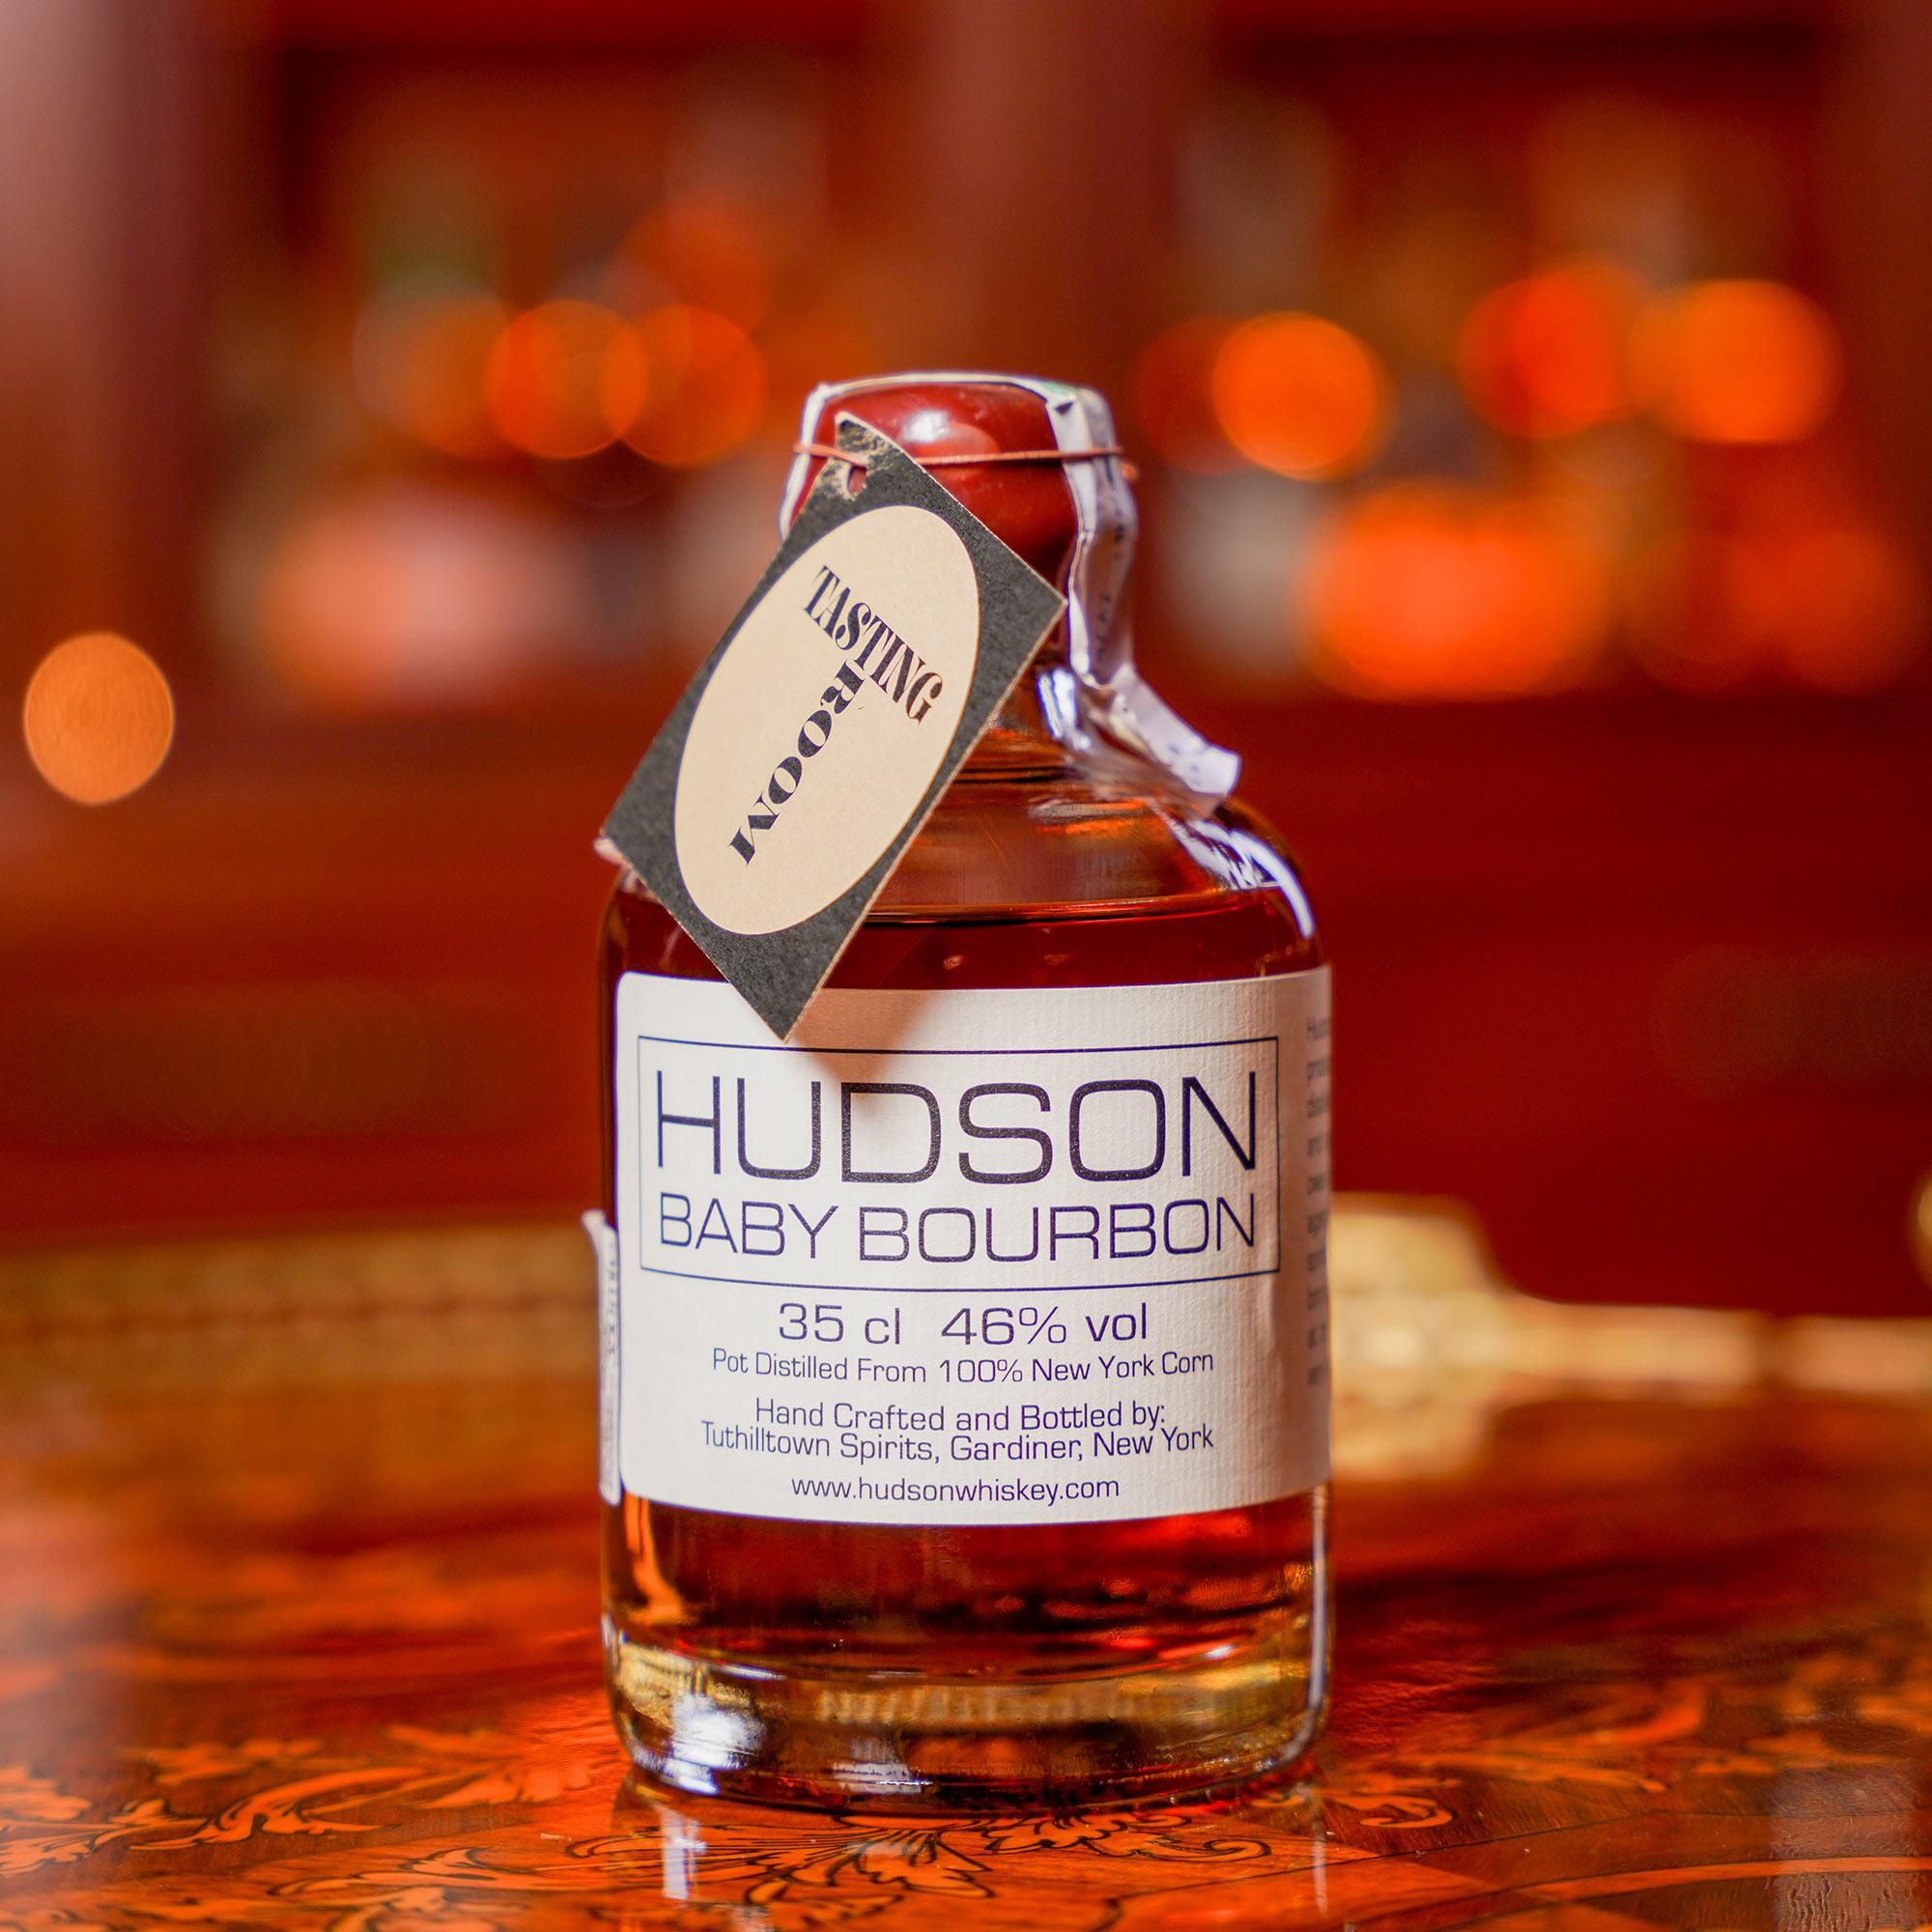 Hudson Baby Bourbon /Хъдсън Бейби Бърбън